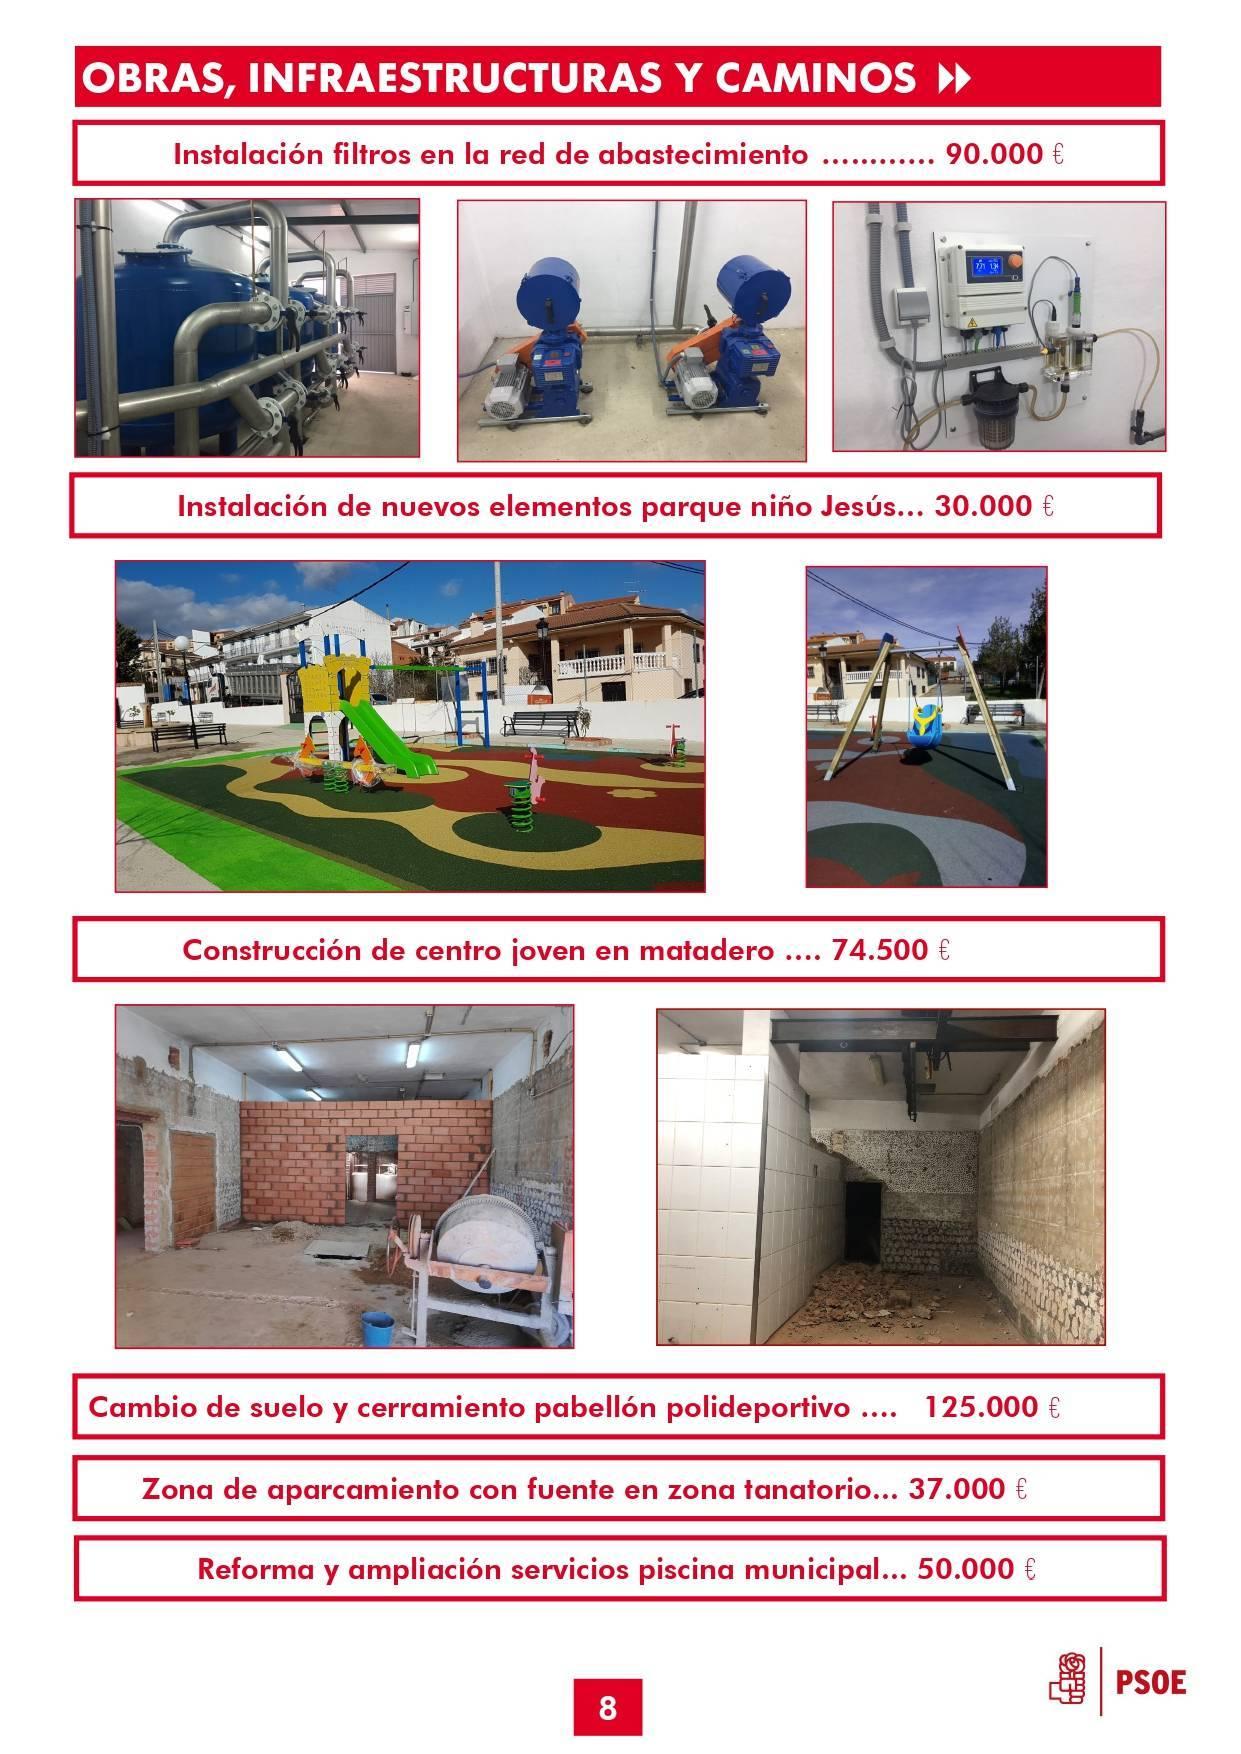 Boletín informativo de gestión municipal 2015-2019 - Guadalupe (Cáceres) 8